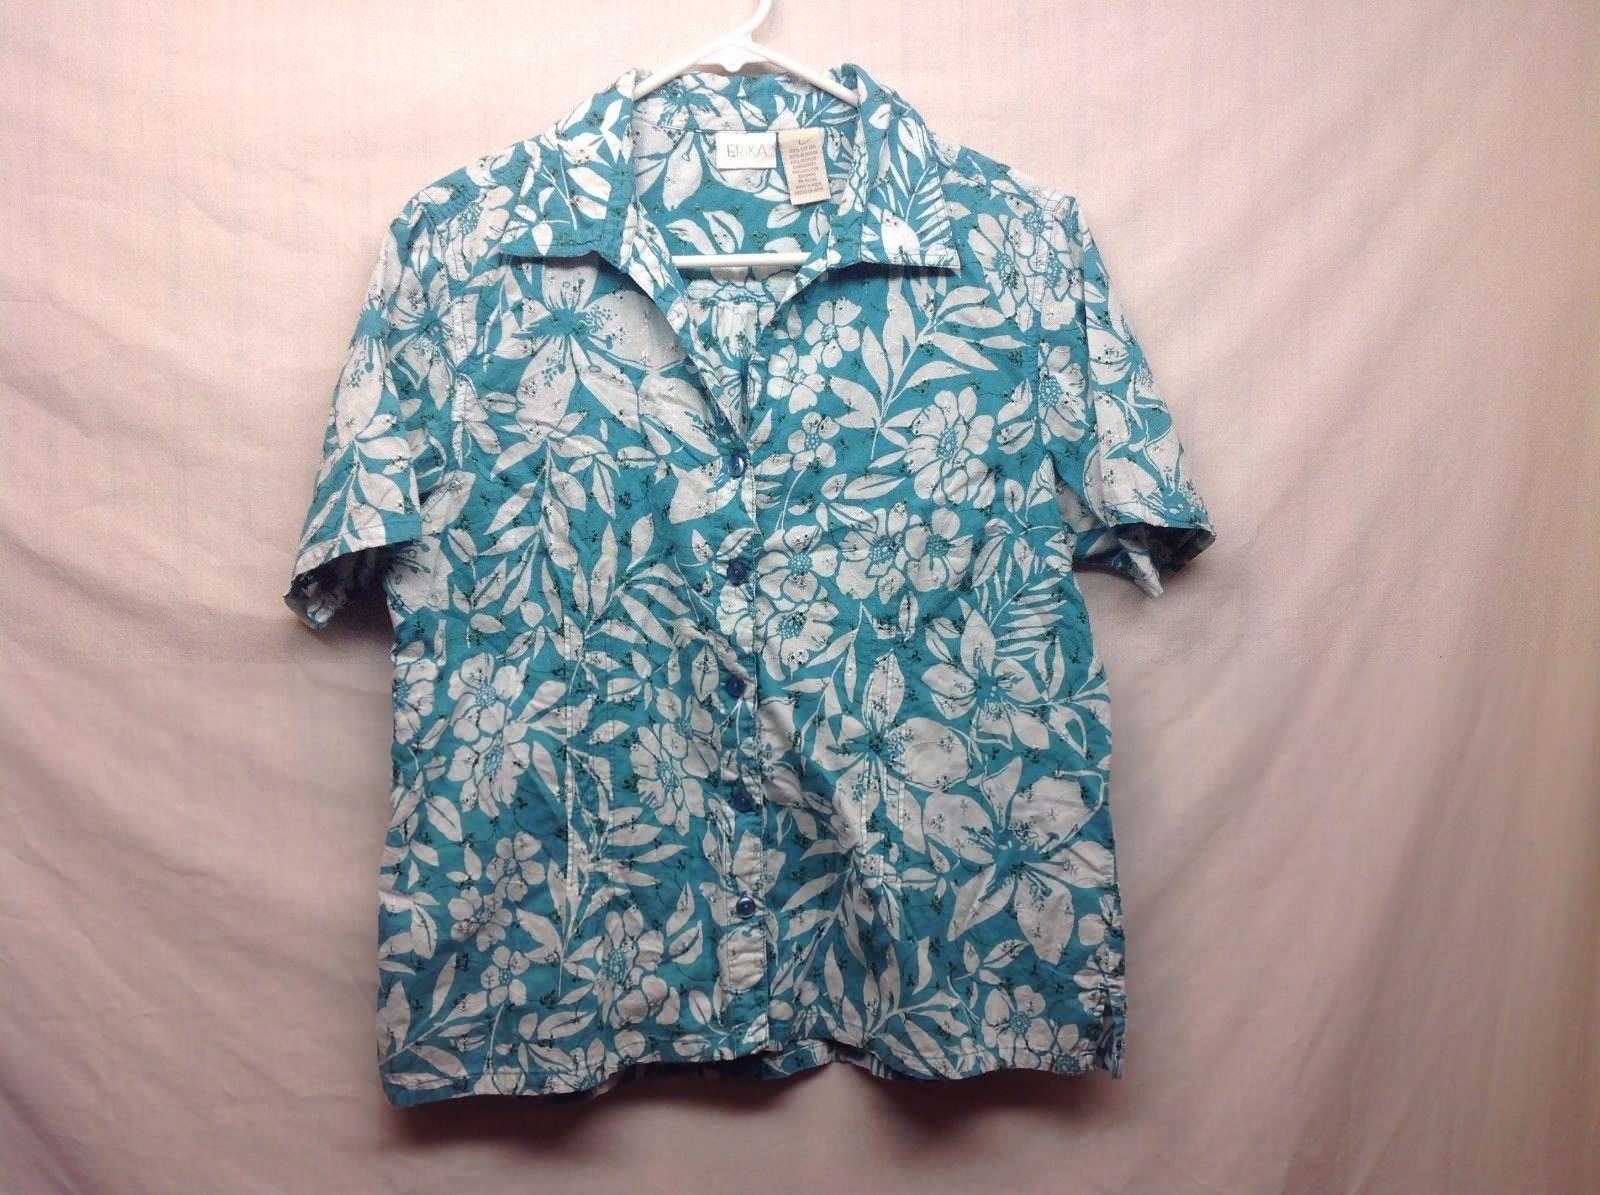 ERIKA V-Neck Button Up Light Blue Top w White Floral Pattern Shirt Sz LG